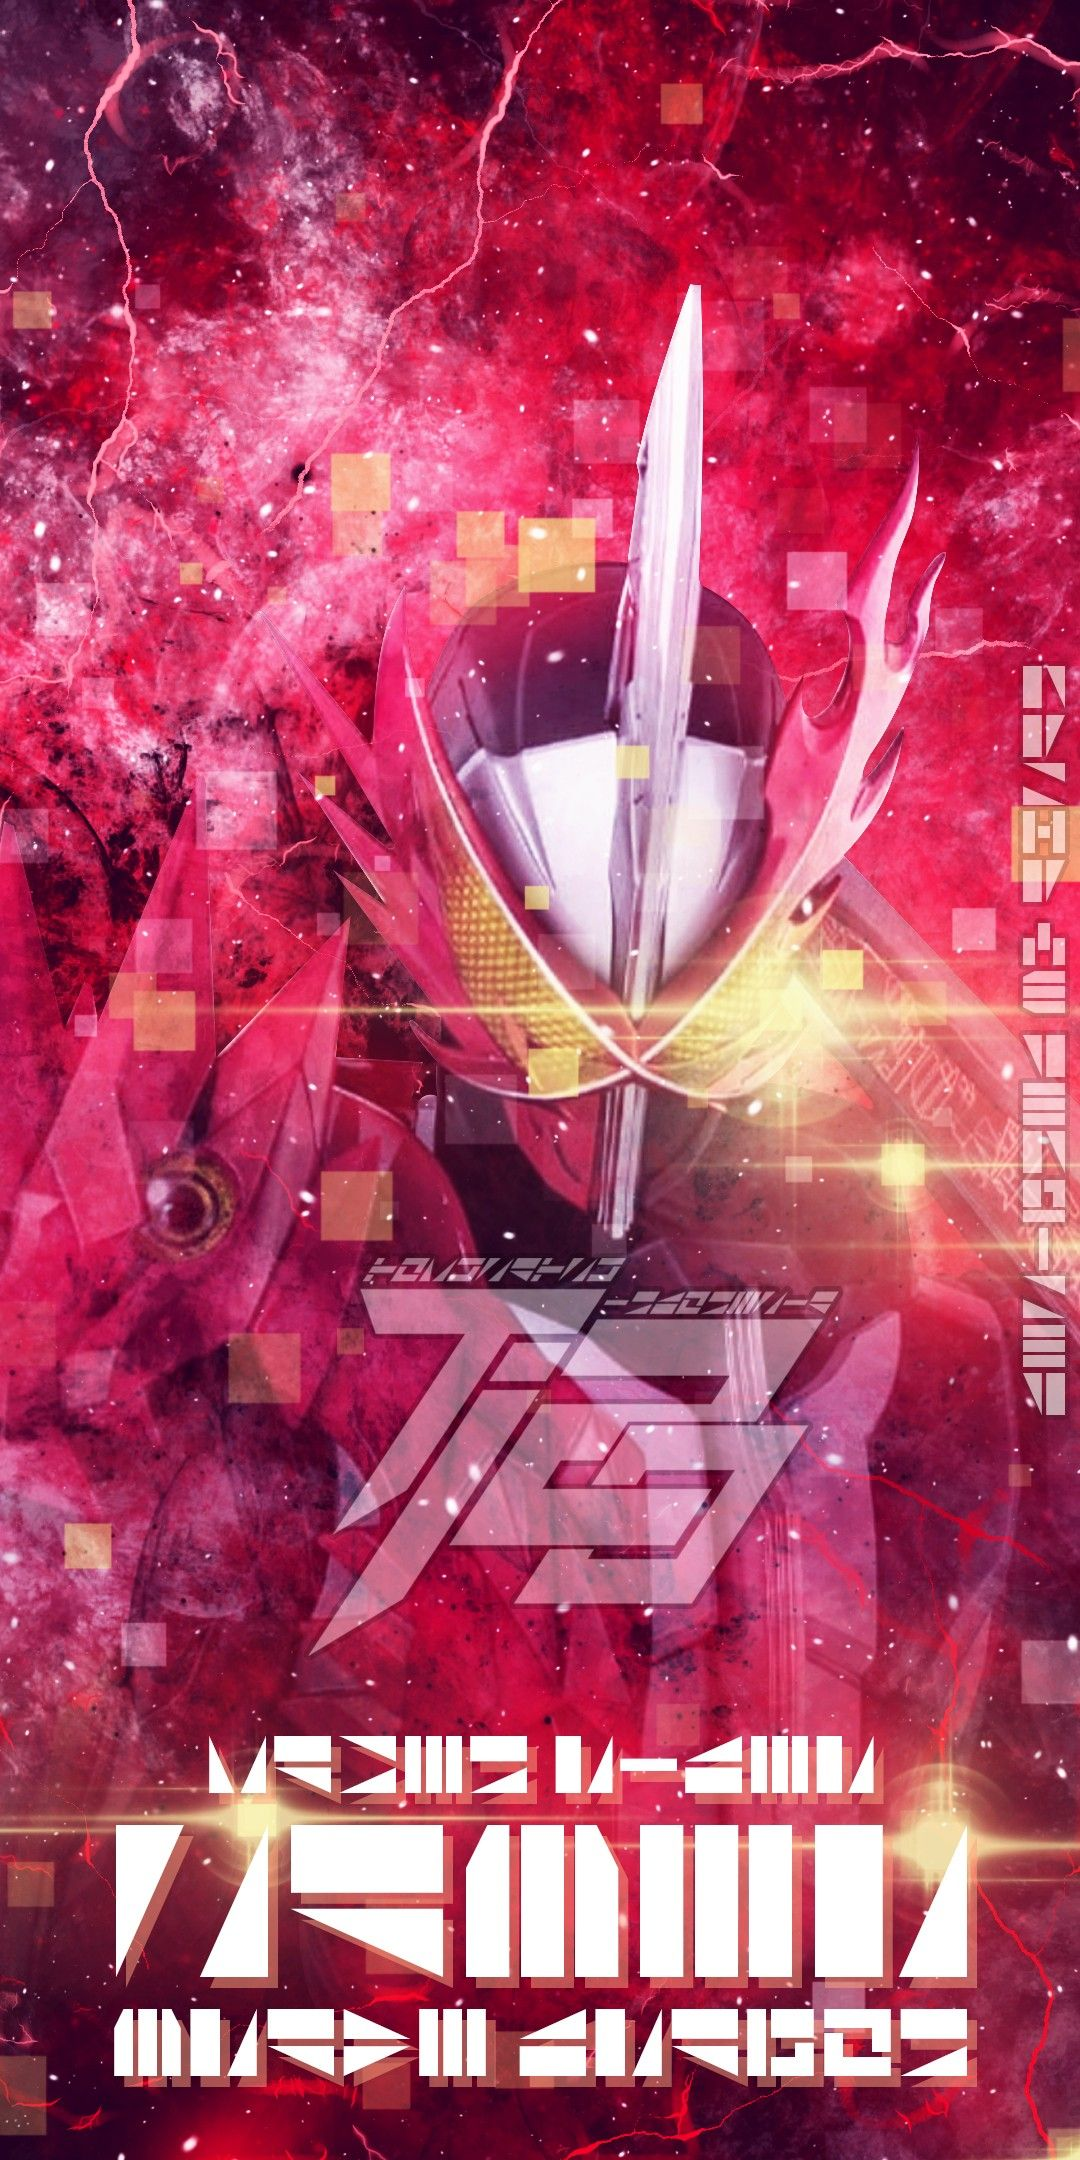 Pin Oleh Ridersaber Di Kamen Rider Saber Seni Seni Anime Ilustrasi